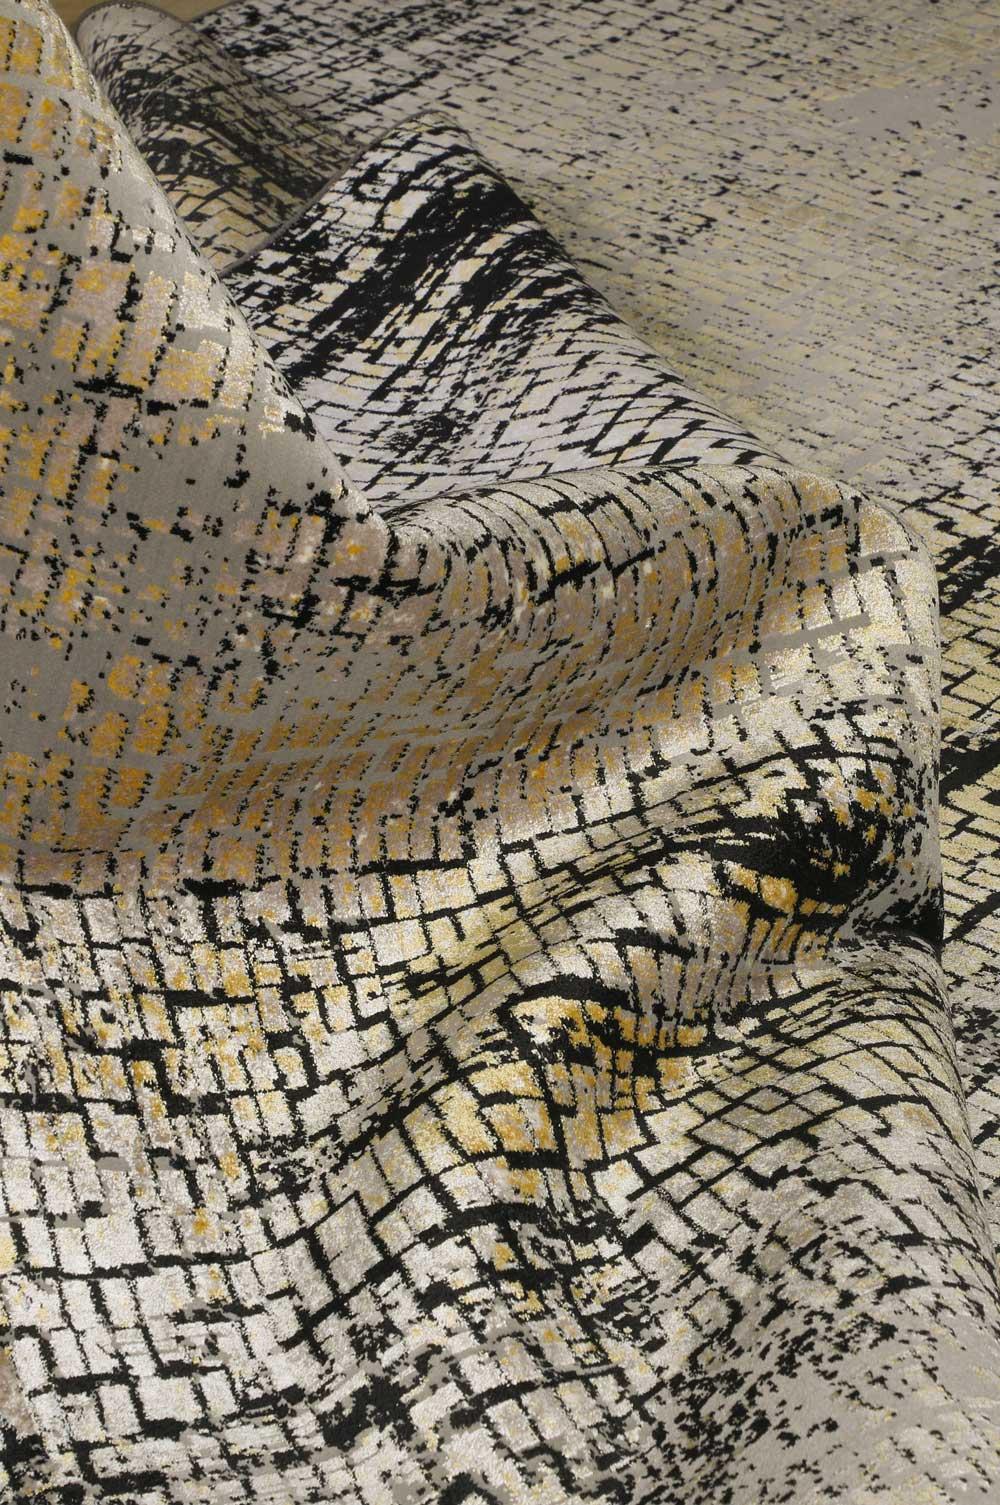 فرش طلایی گلدن ادیشن | شرکت فرش اکسیر